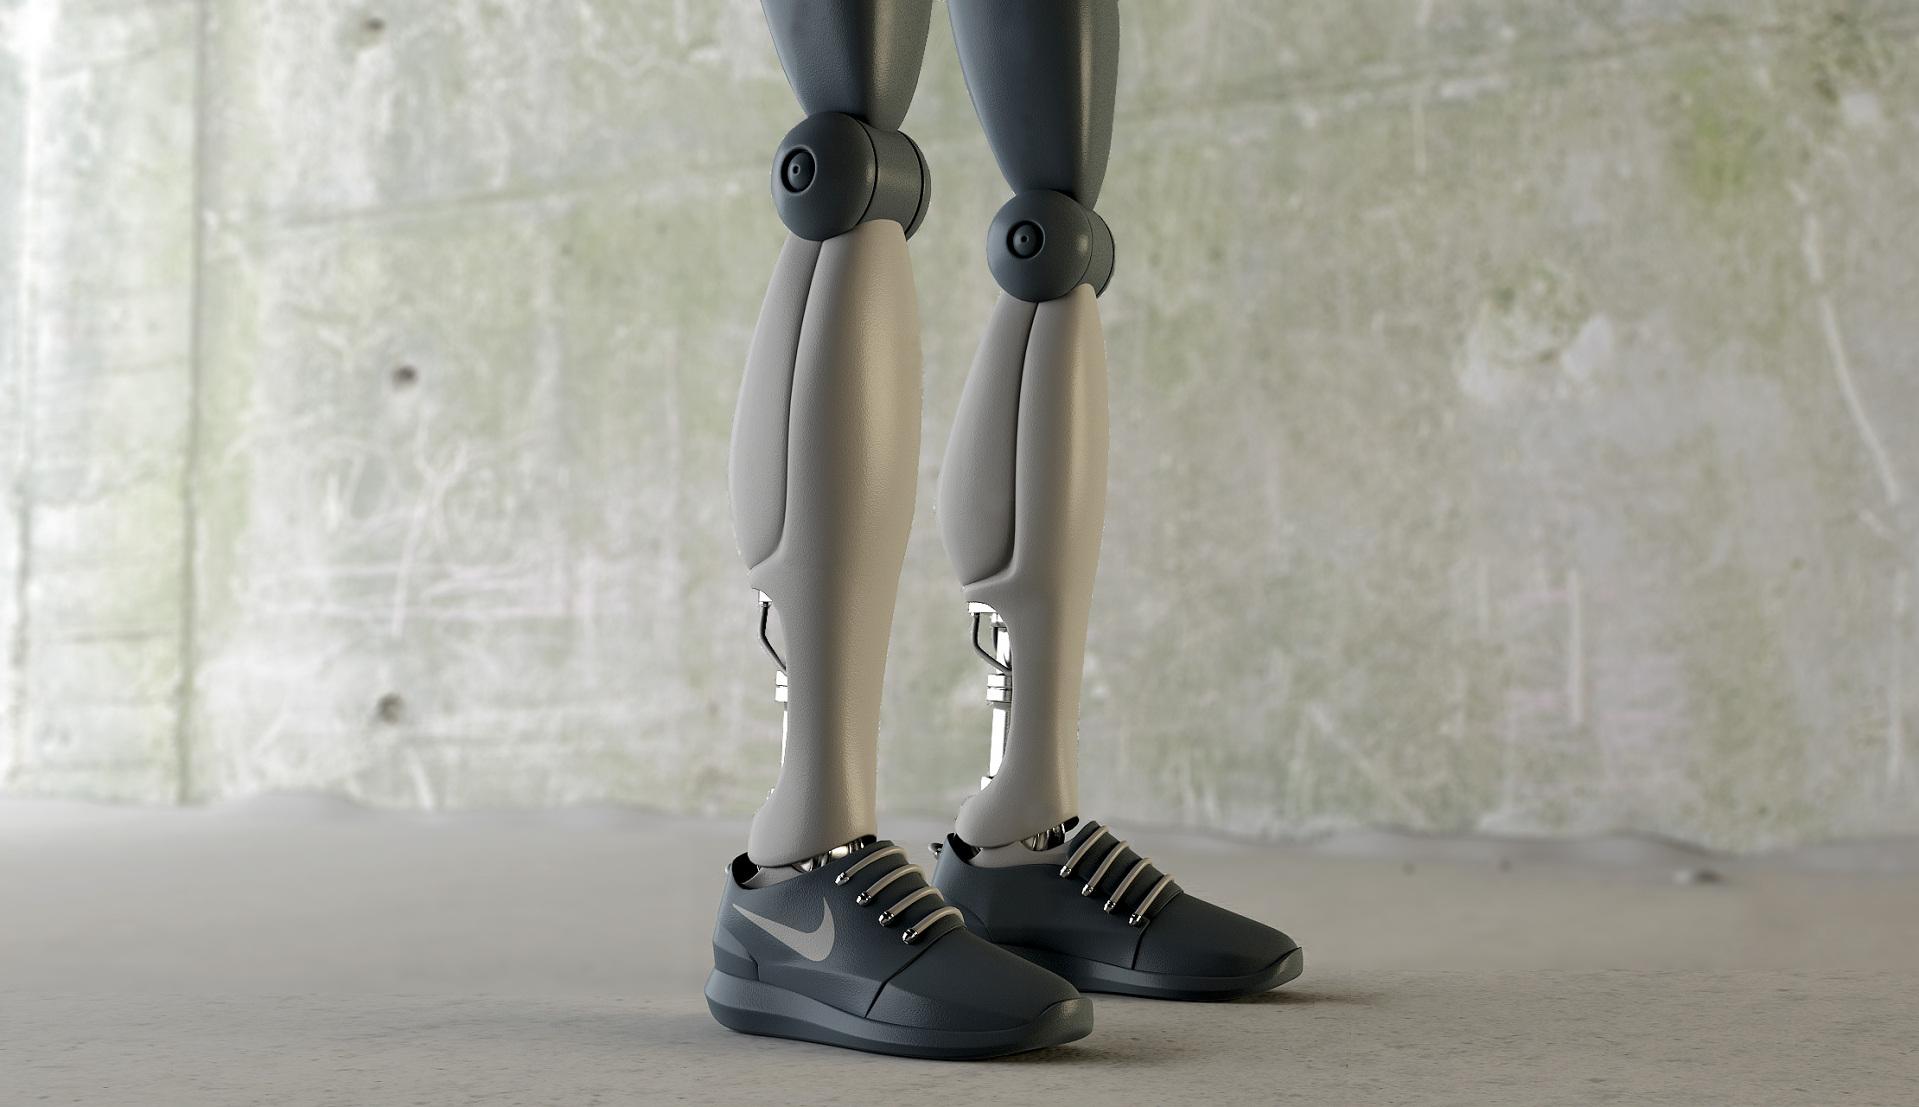 nike-robotics-simeon-georgiev-2-1920x1107